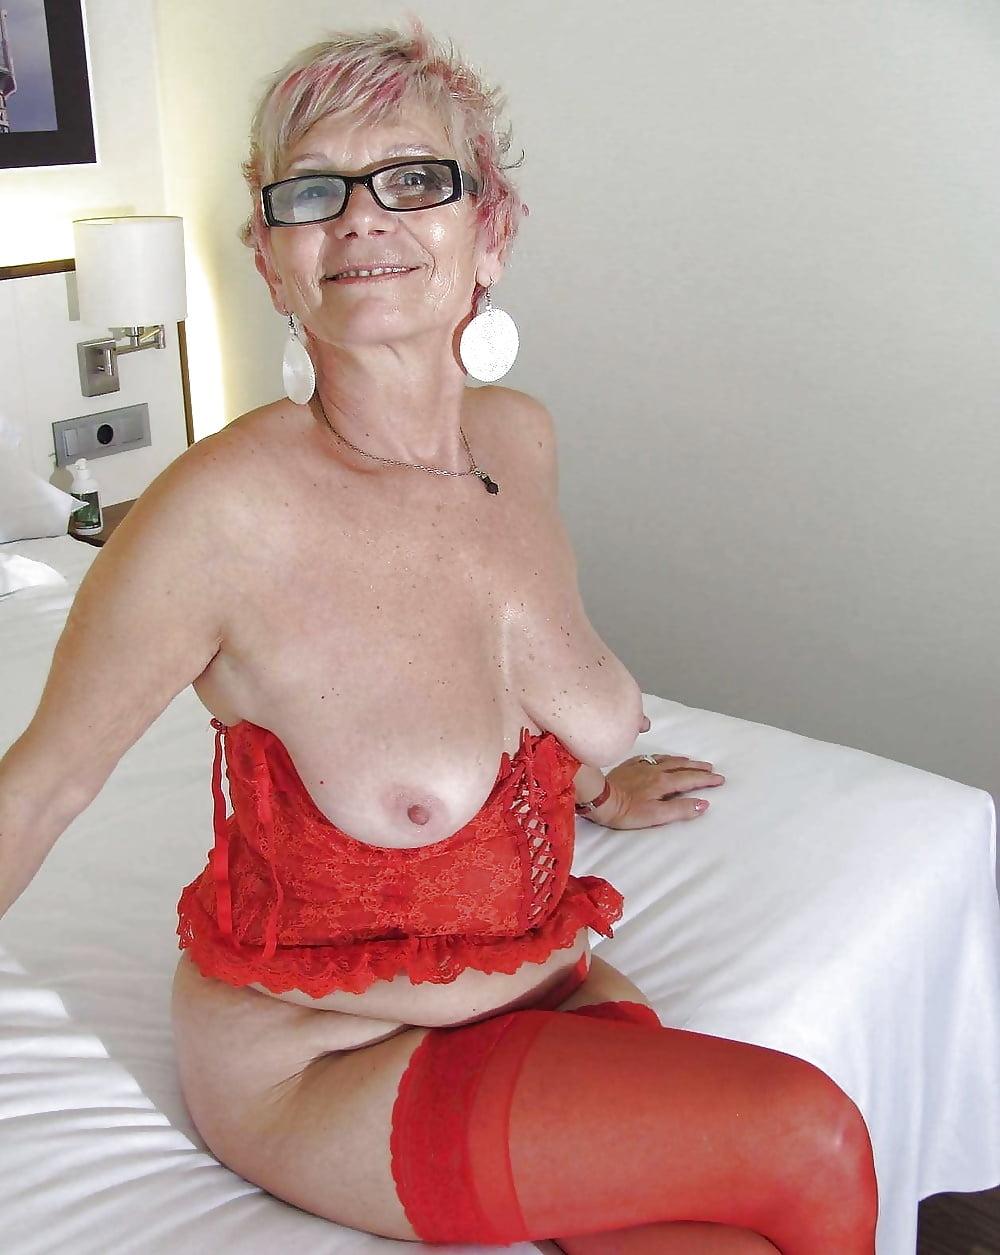 Older women sagging breasts galleries big booty booty